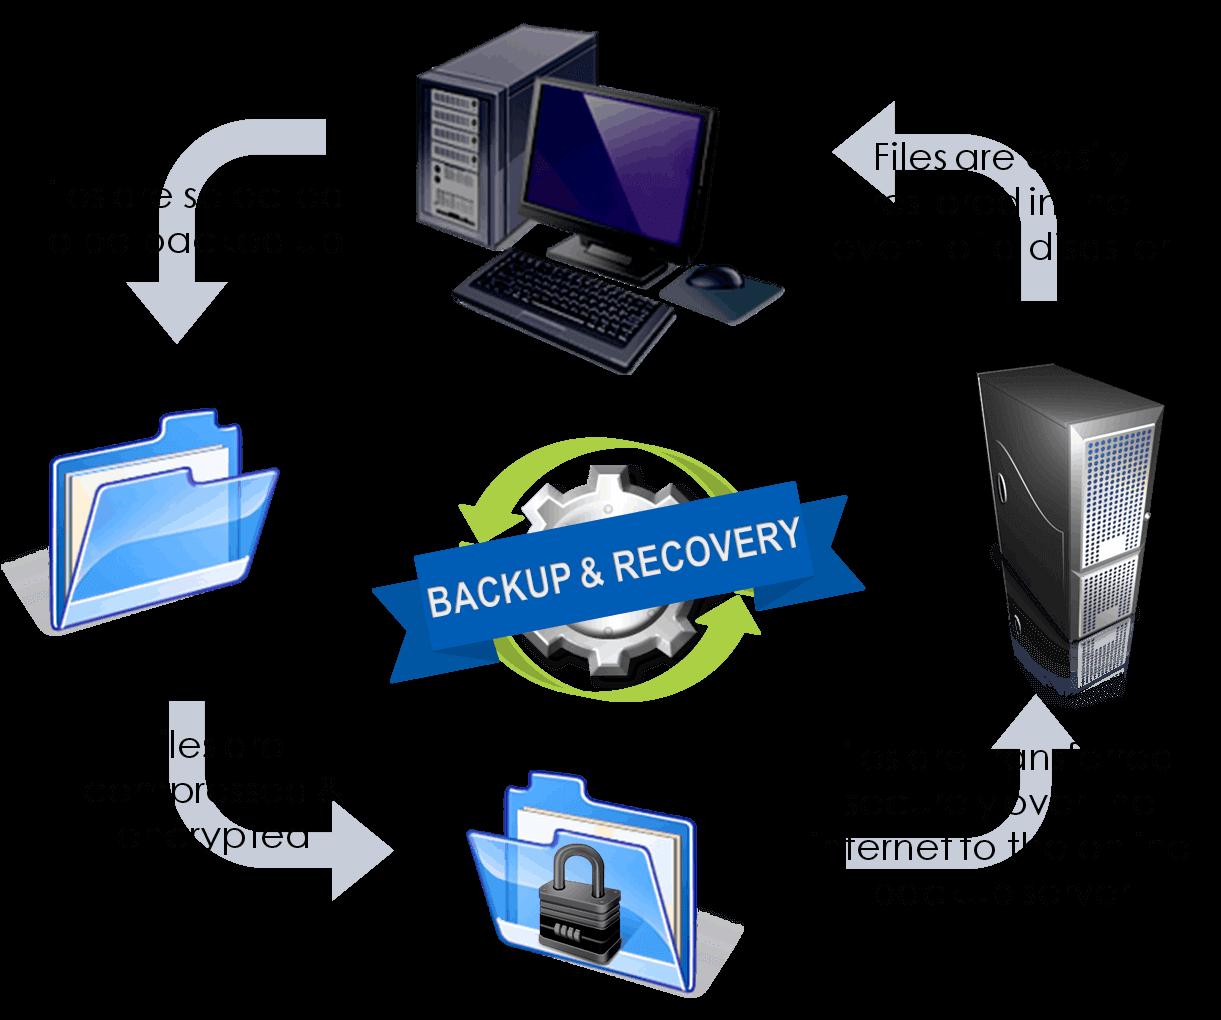 Storage Backup & Recovery